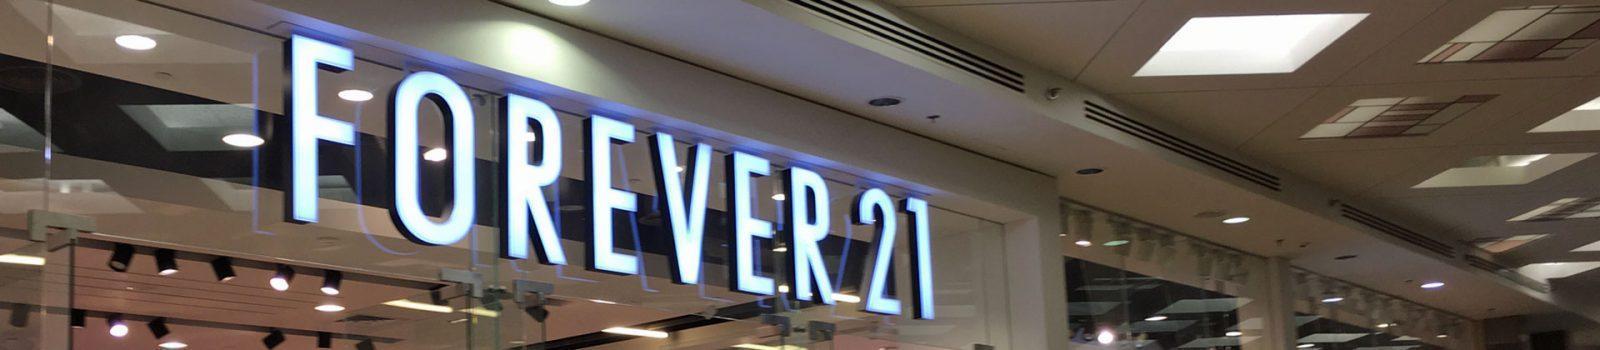 Forever21-1920x420-fullw